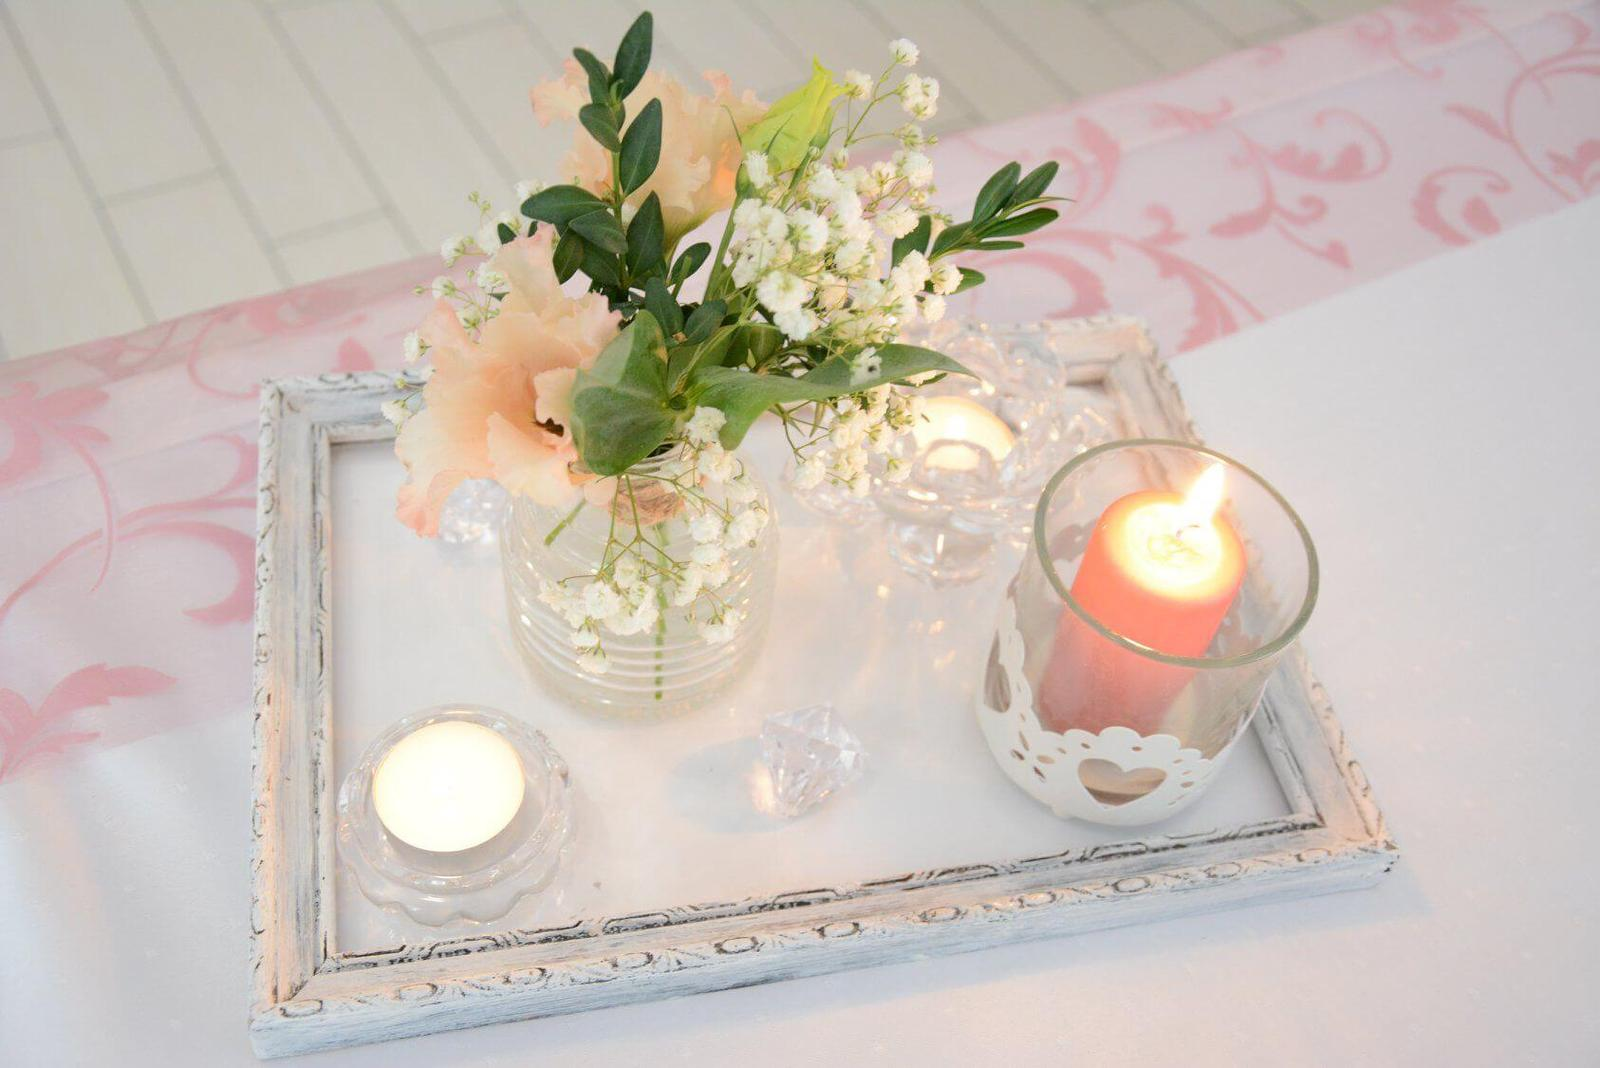 podnos pod sviečky, vázy - rám  - Obrázok č. 2